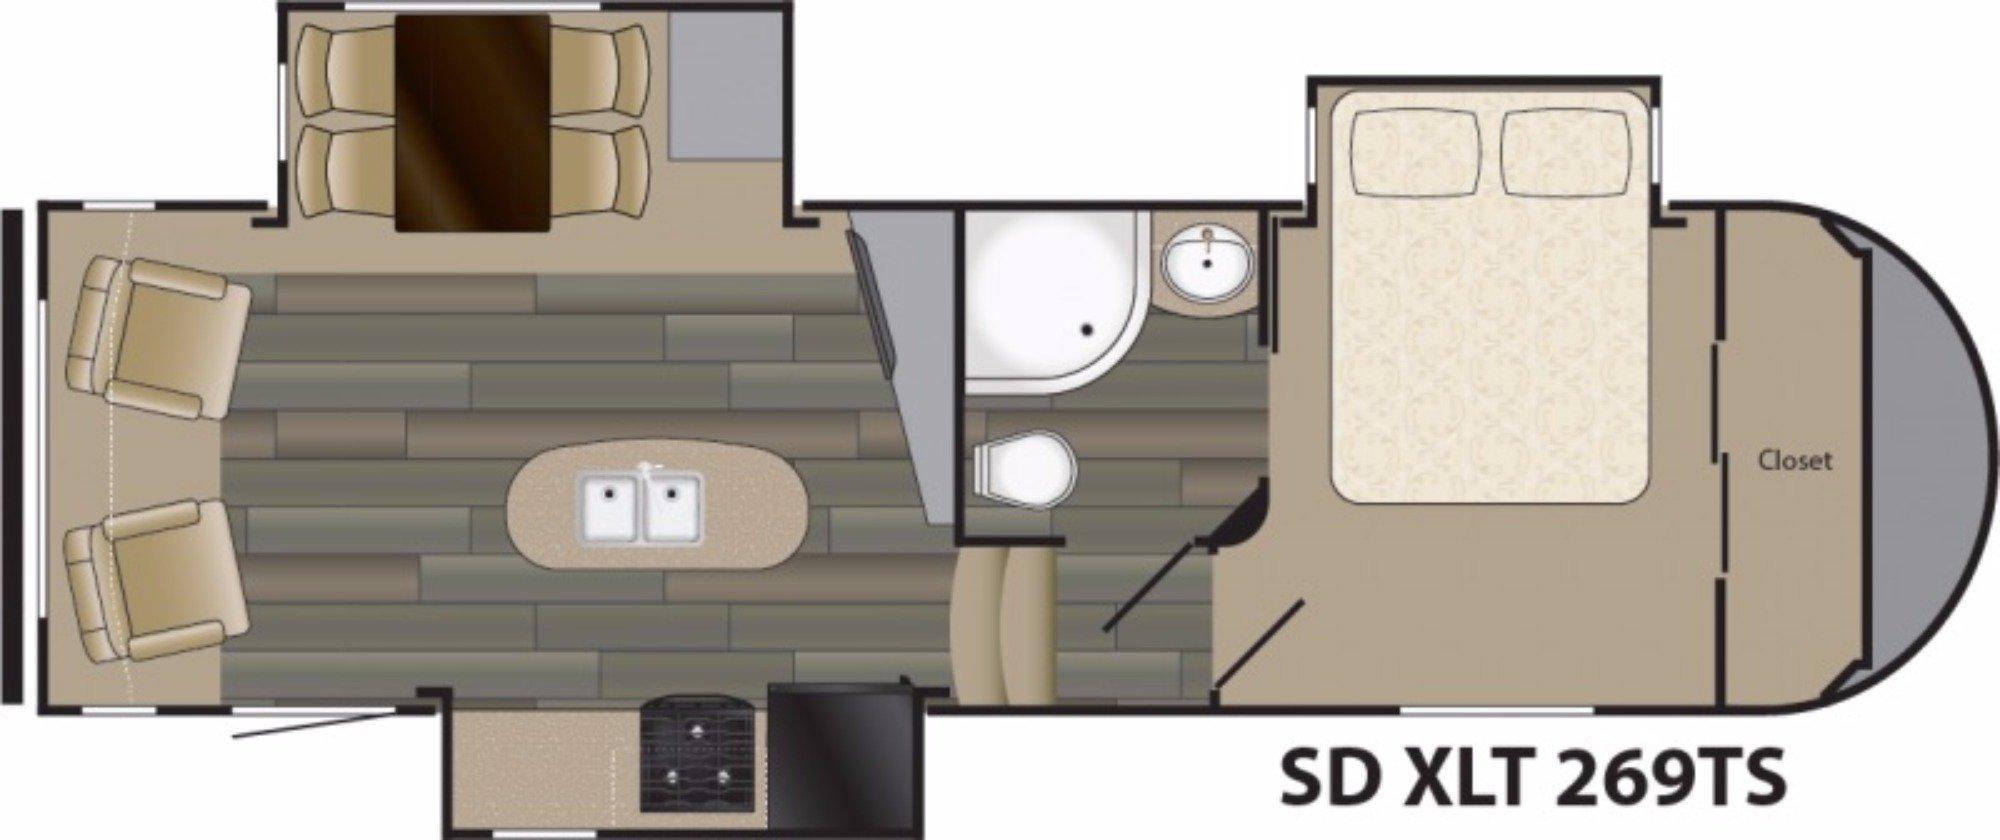 View Floor Plan for 2018 HEARTLAND SUNDANCE S5 269TS